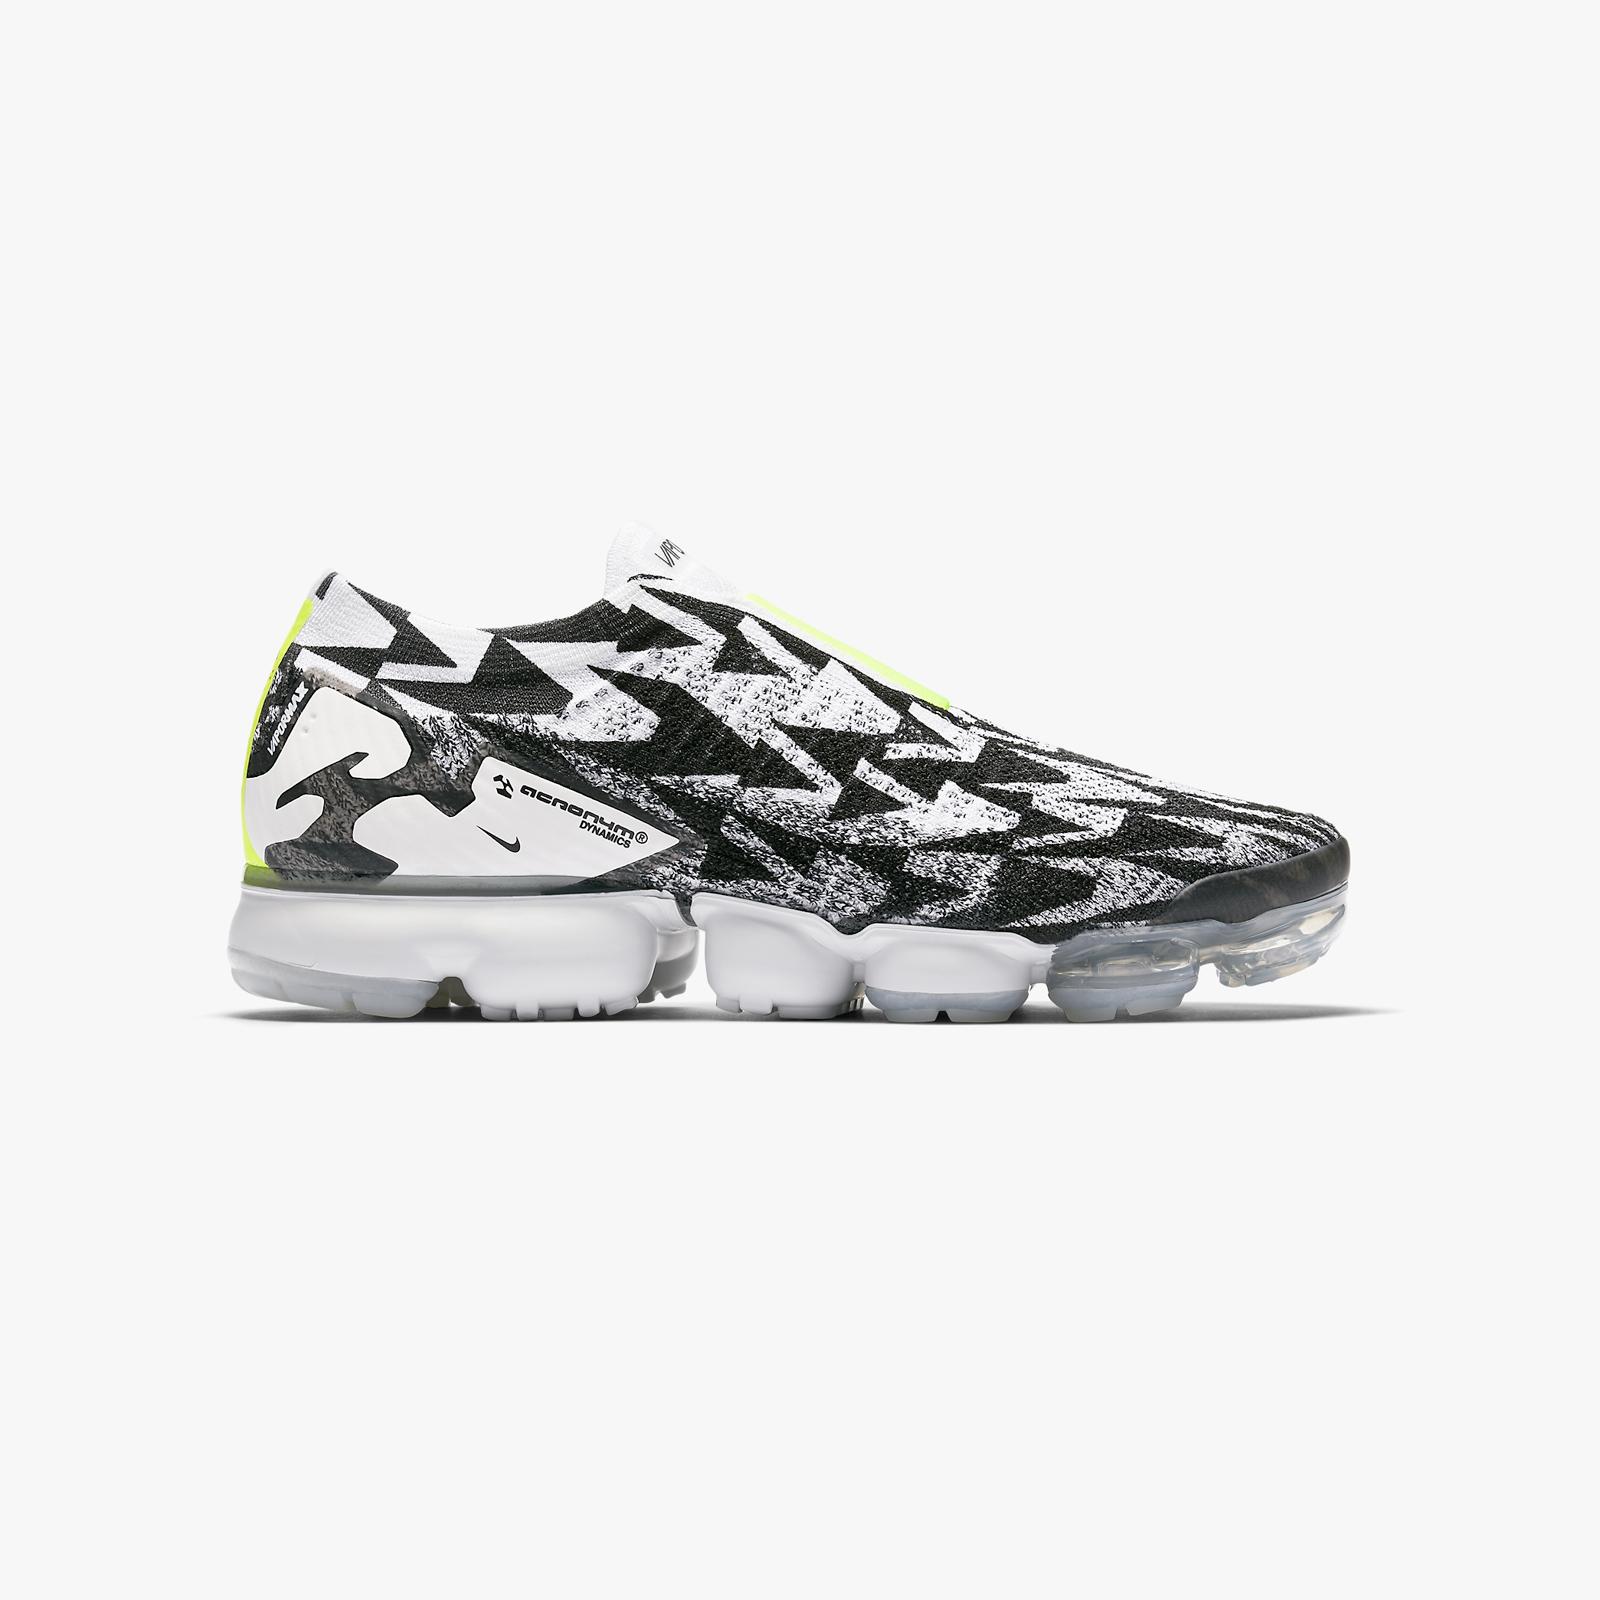 e6e30b12f4 Nike Air Vapormax FK Moc 2 / ACRONYM - Aq0996-001 - Sneakersnstuff ...